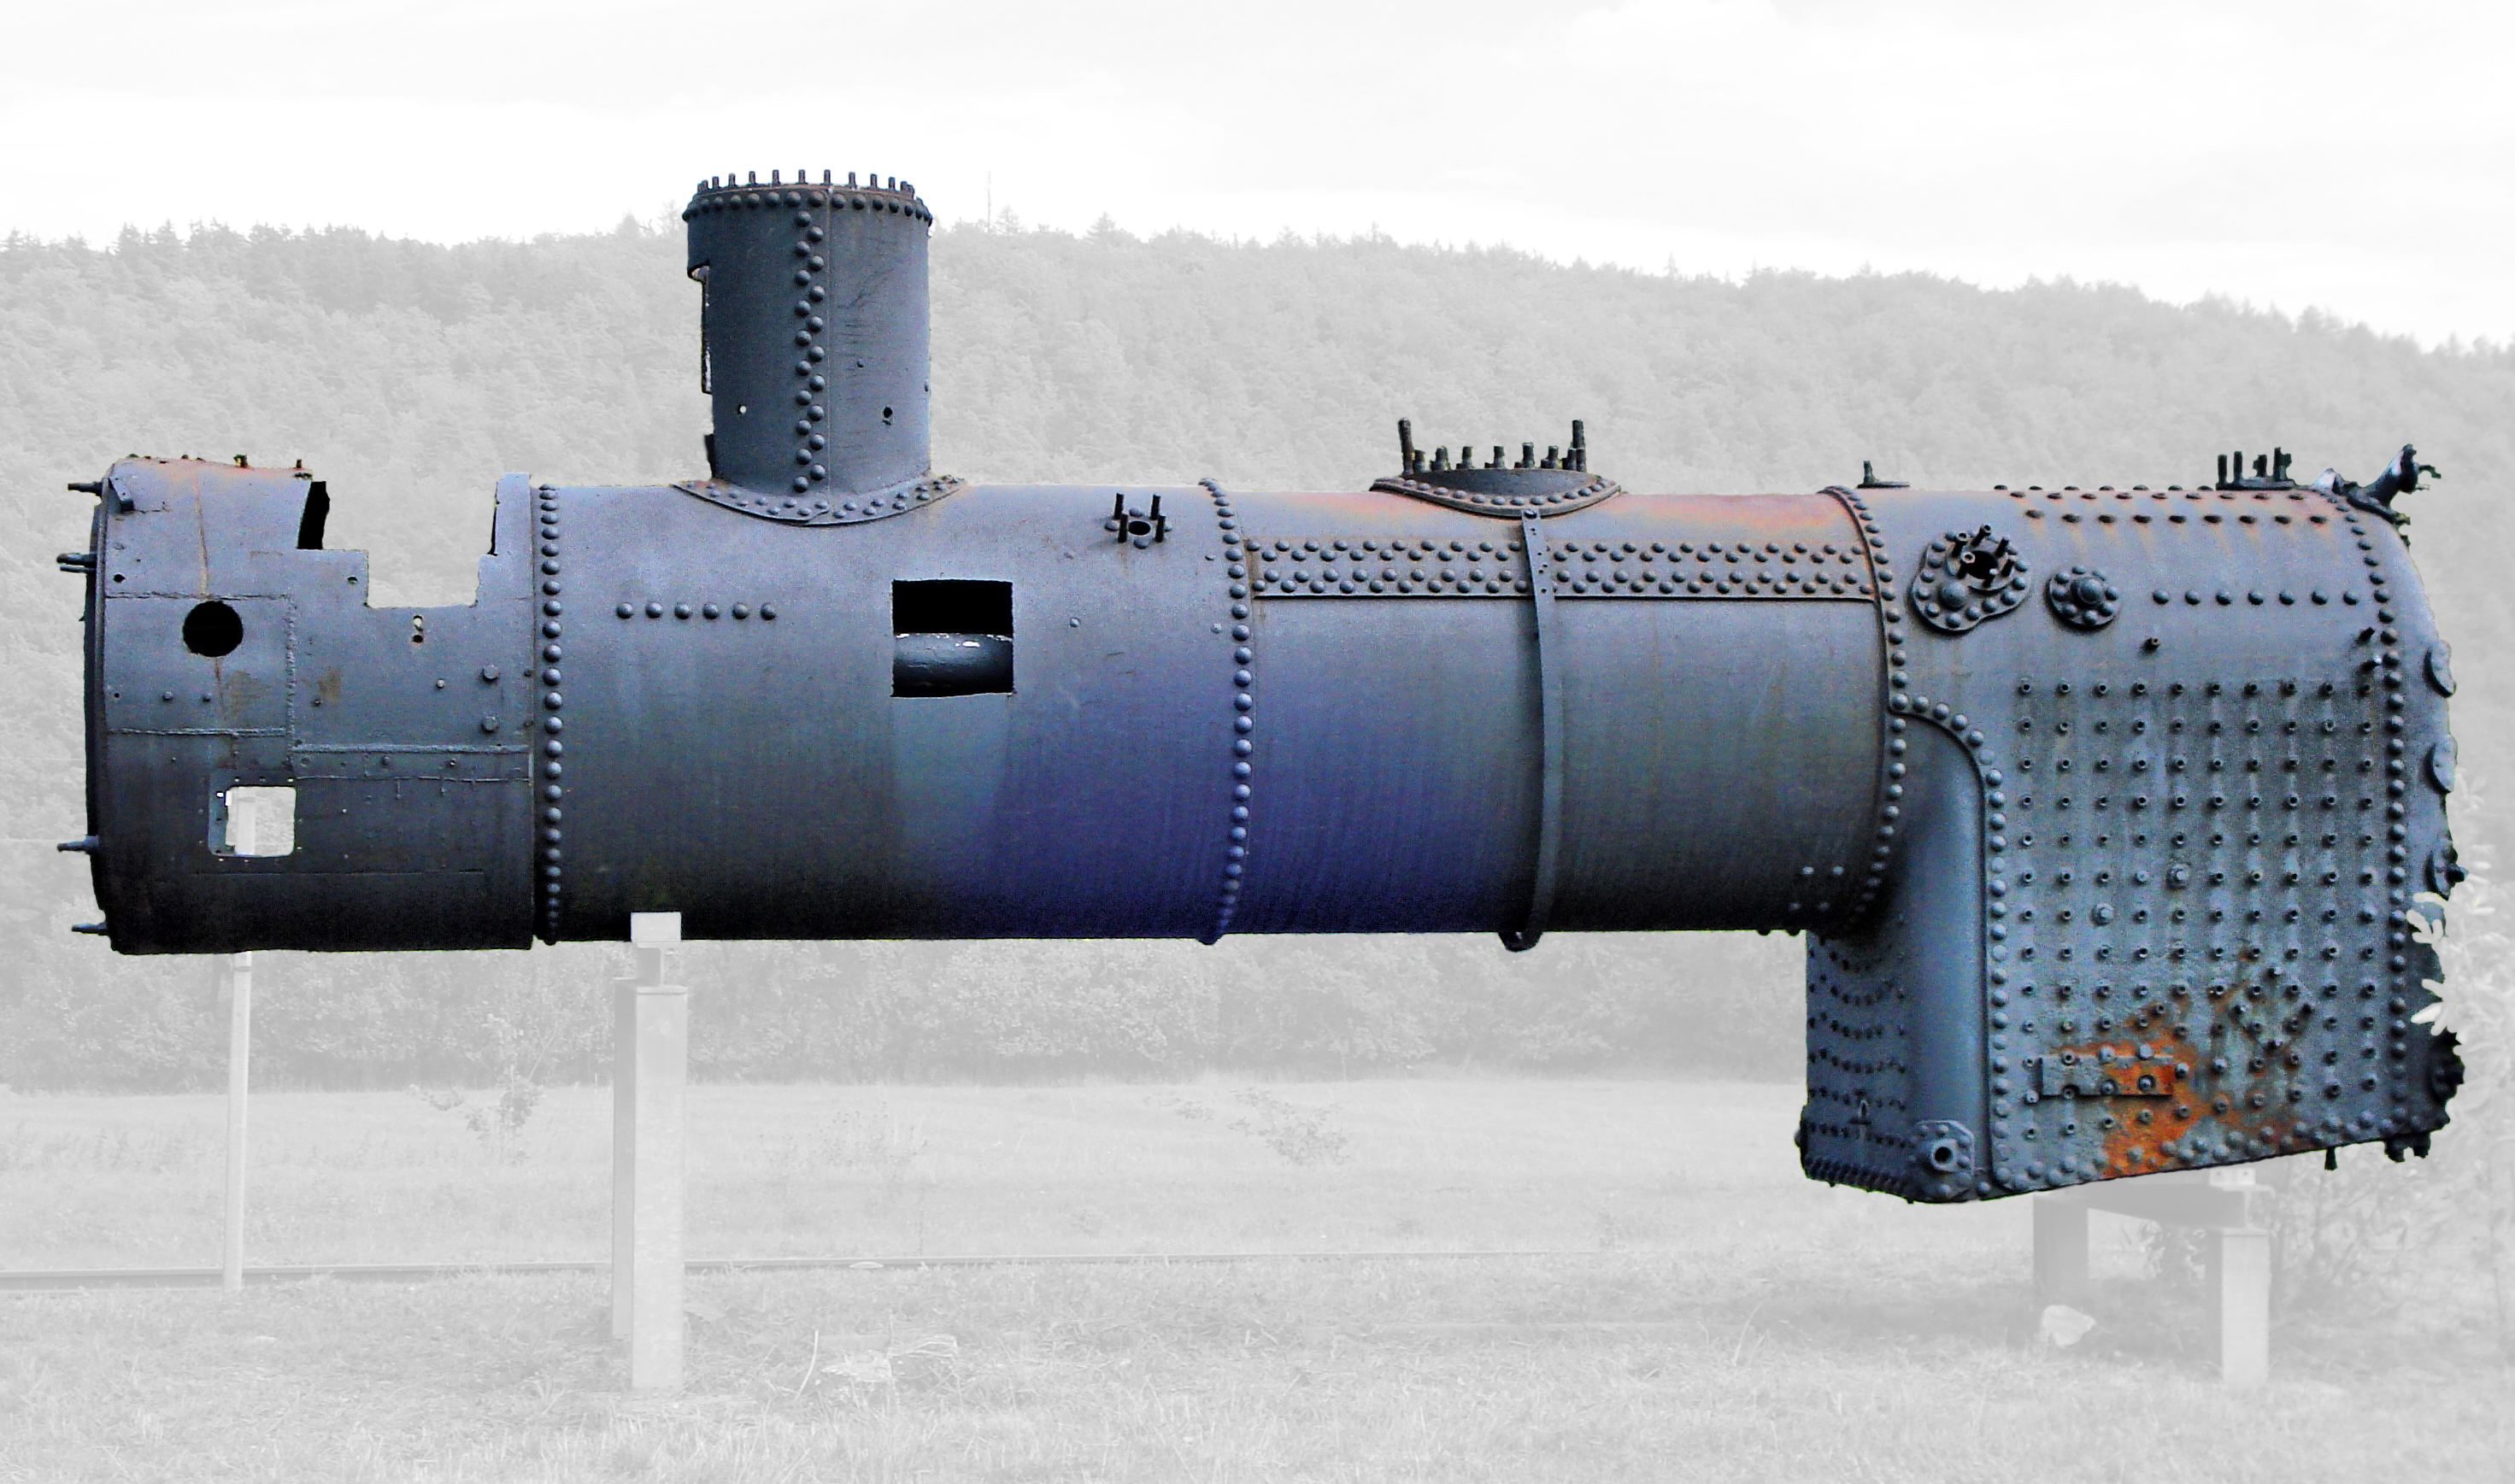 File:Fladungen Dampfkessel.jpg - Wikimedia Commons